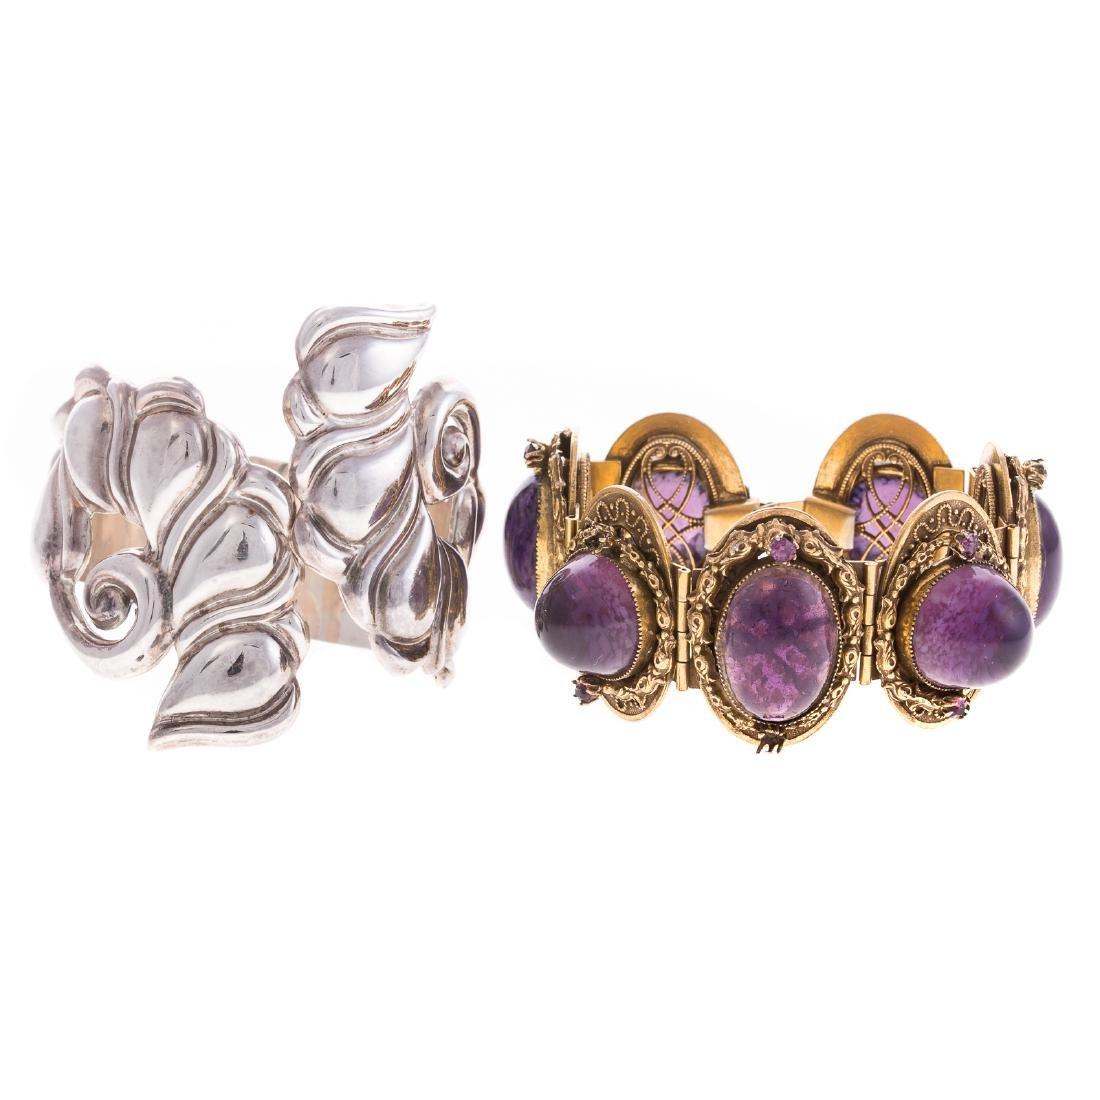 A Pair of Wide Lady's Bracelets